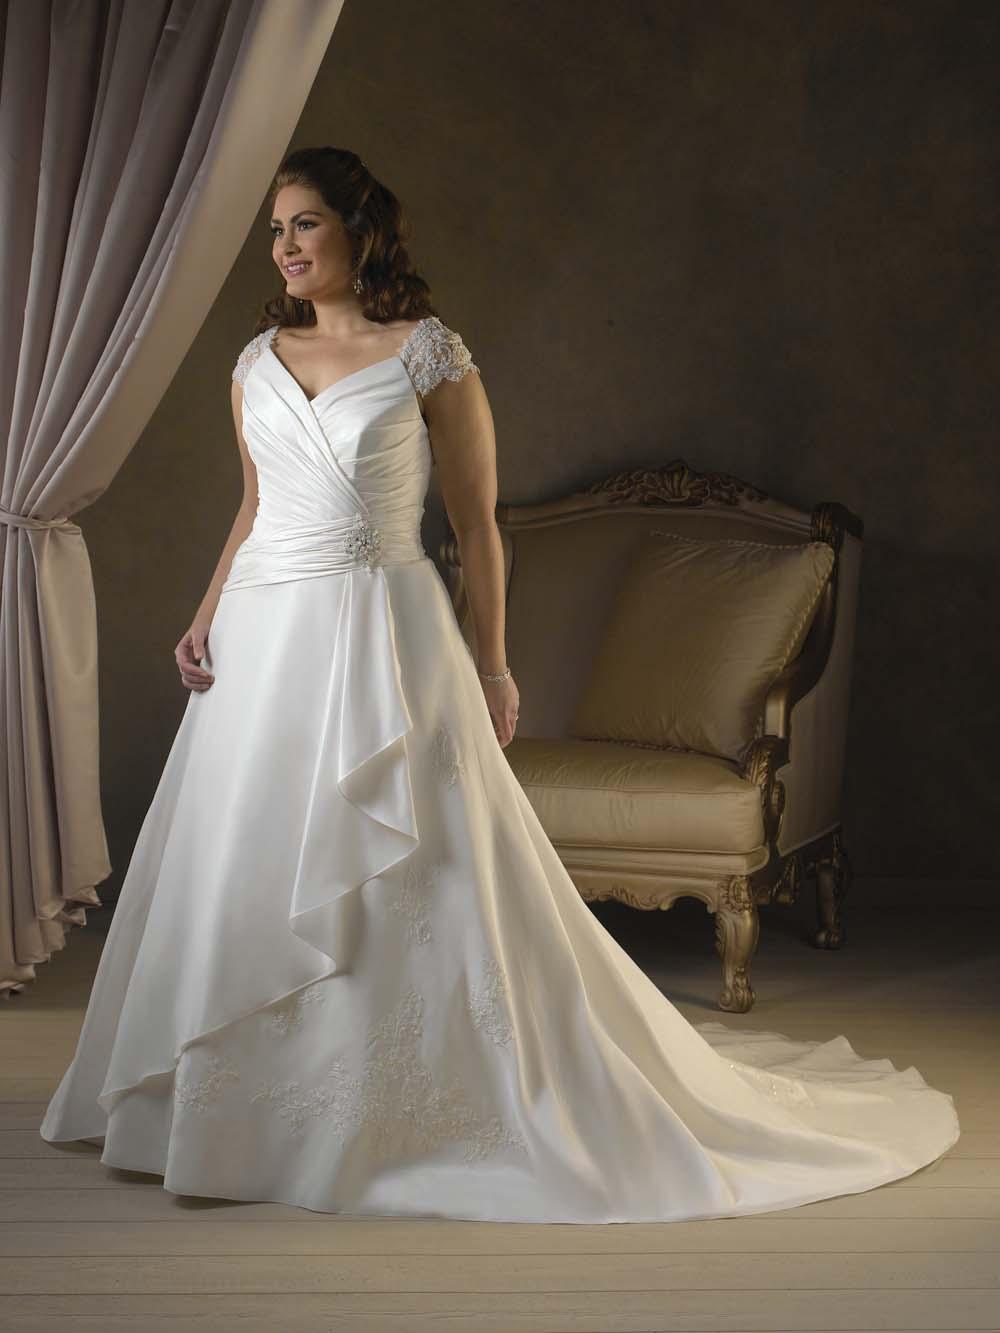 BEST SLEEVED WEDDING DRESSEScronicassico tropicas